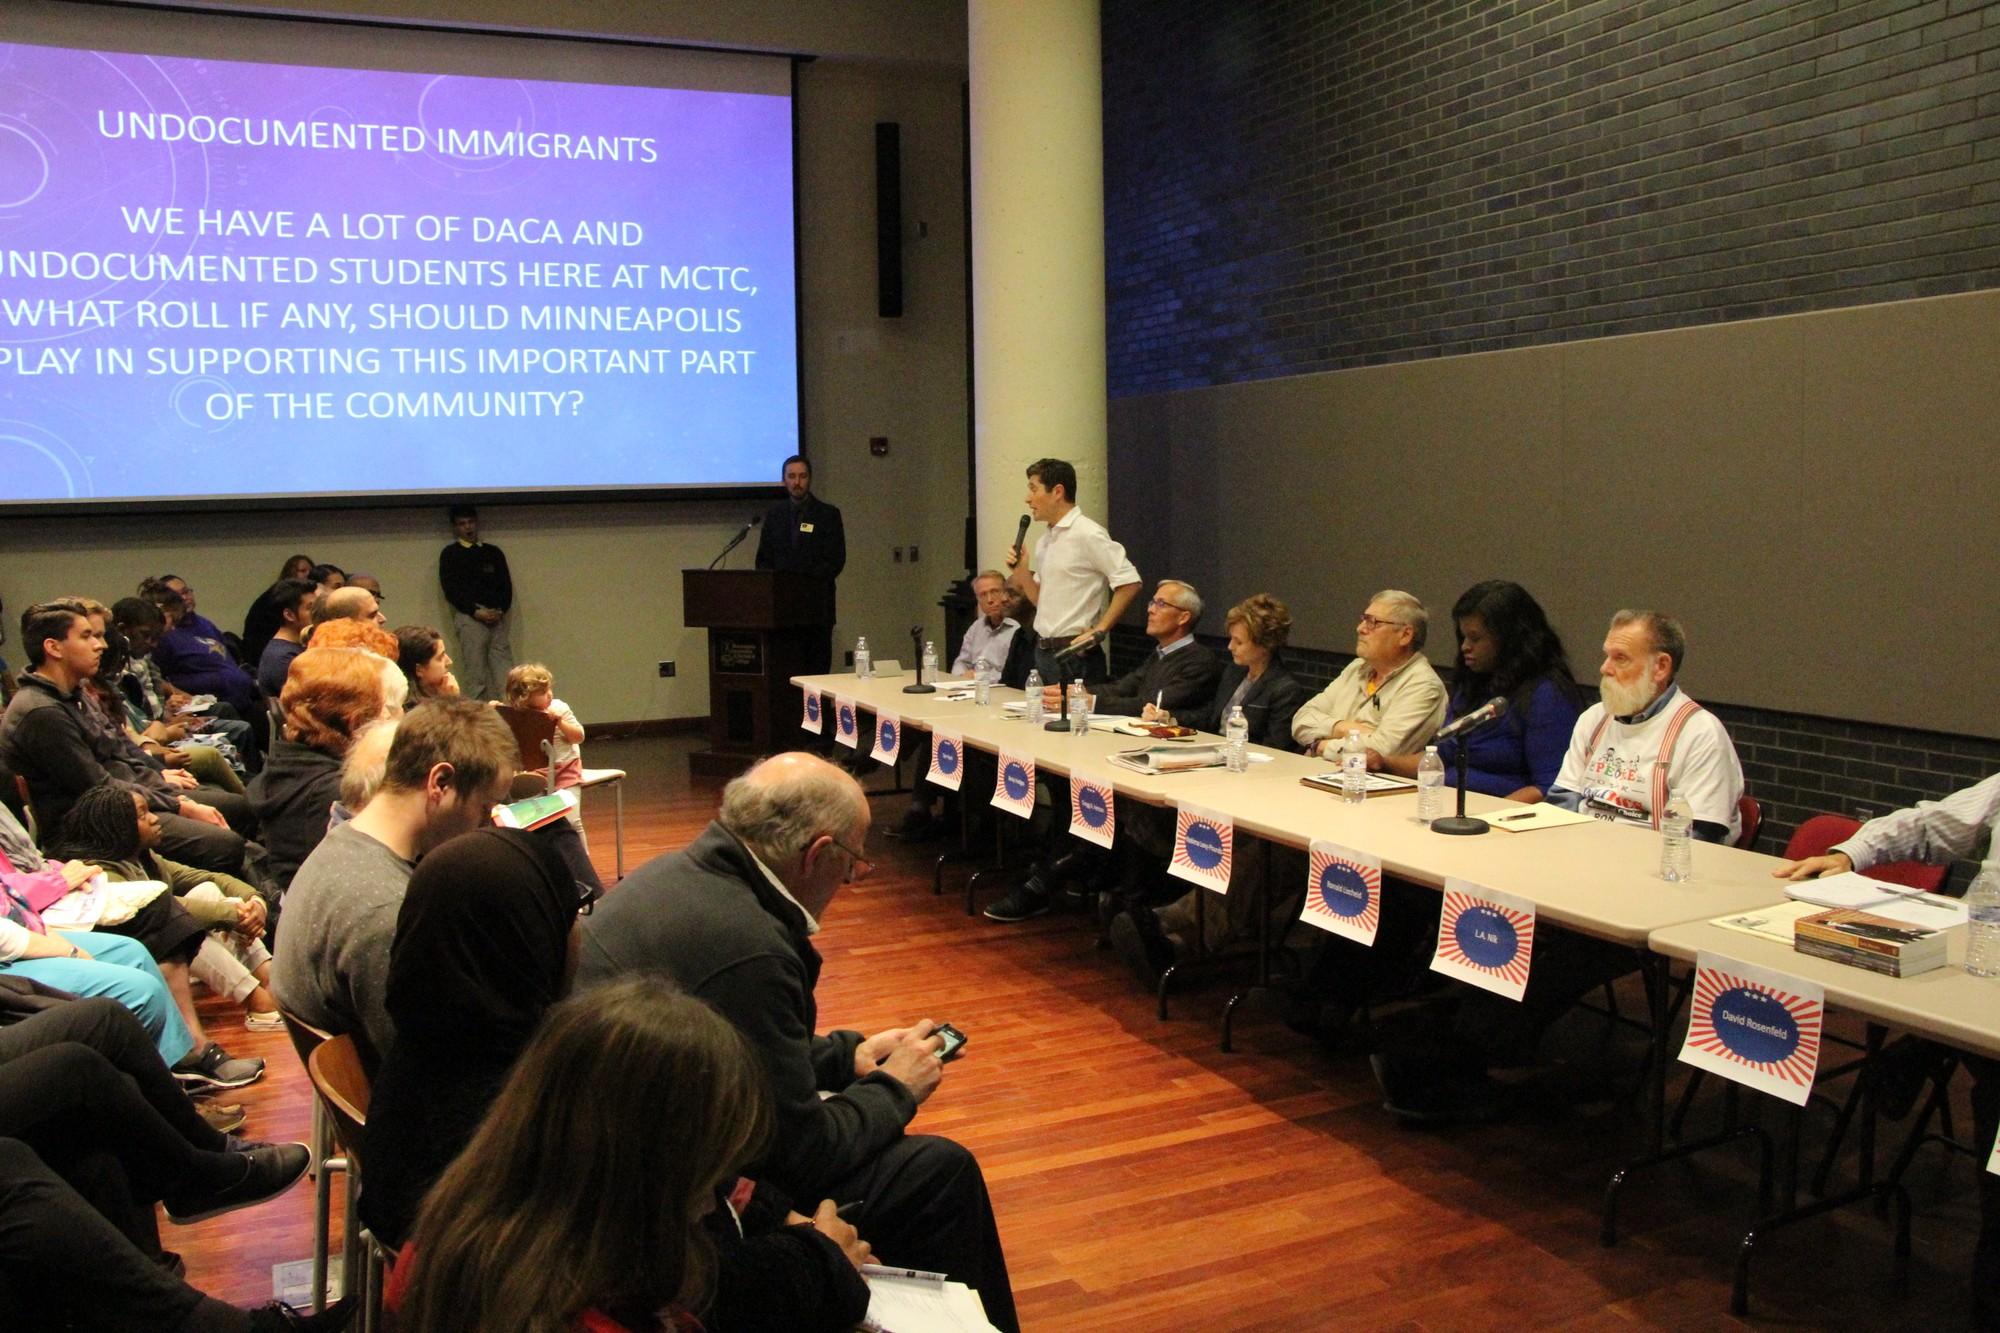 Fringe candidates make mayoral forum spicy